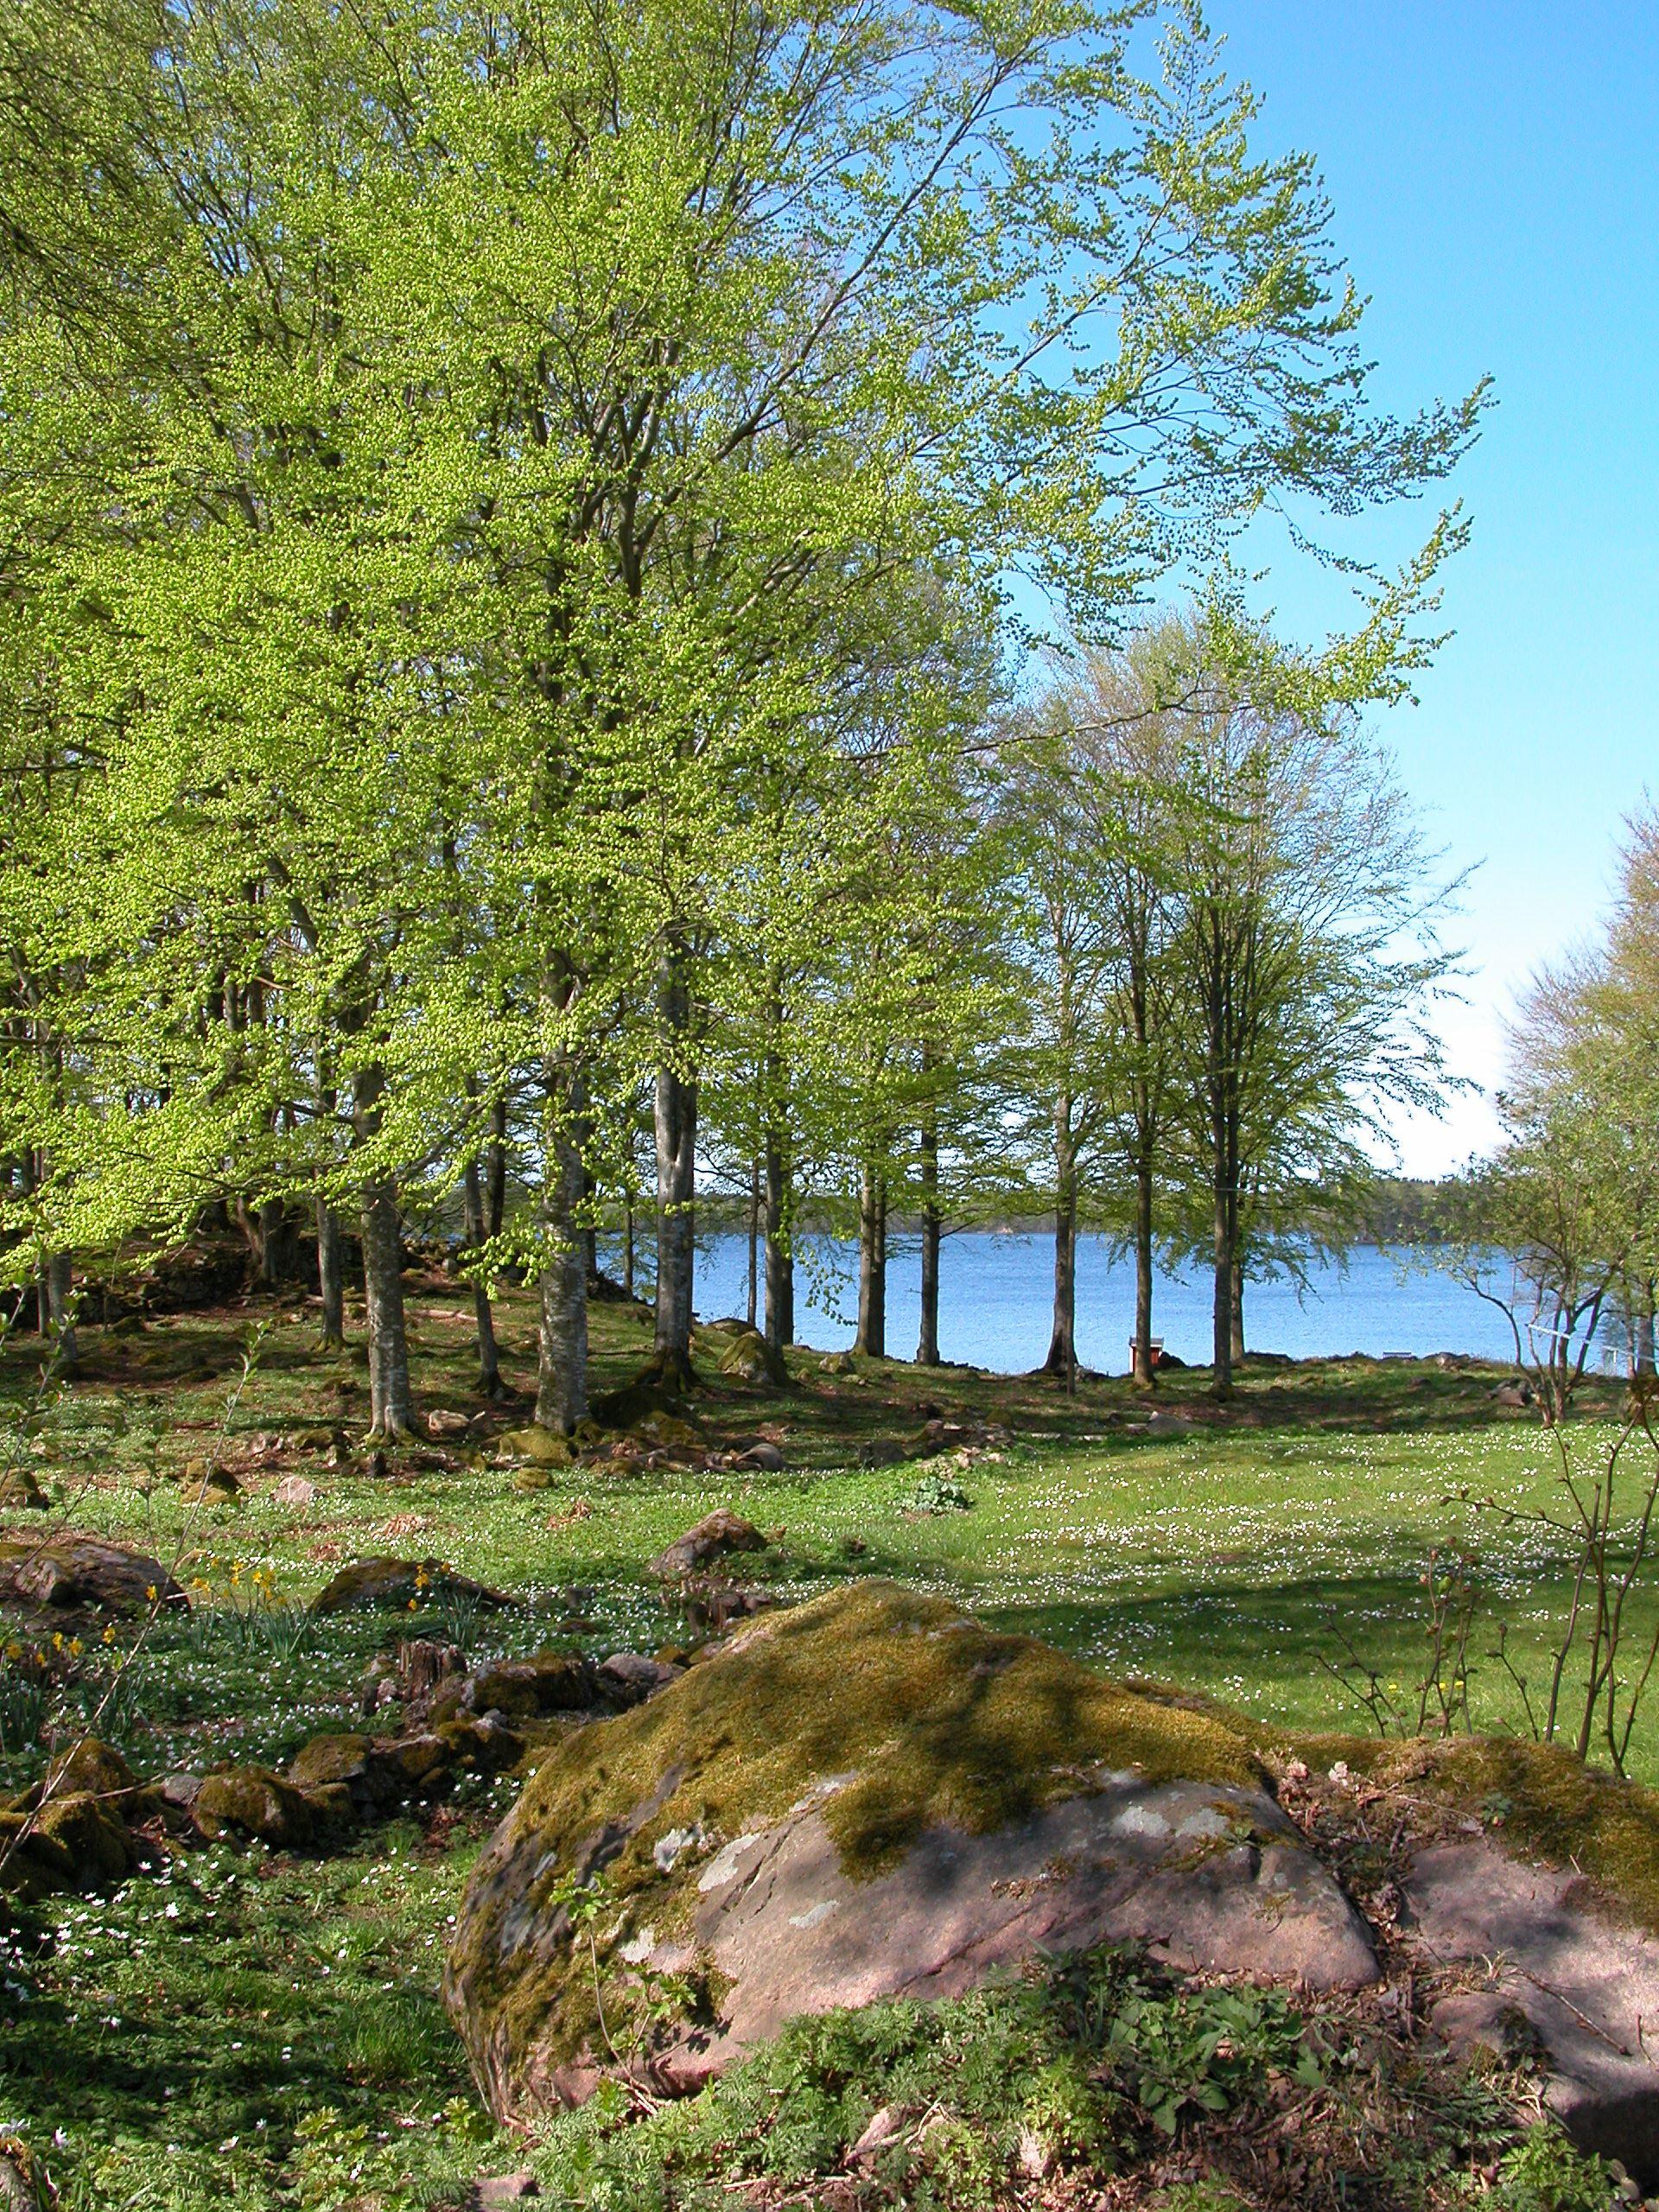 Kronan and Möckelsnäs nature reserve